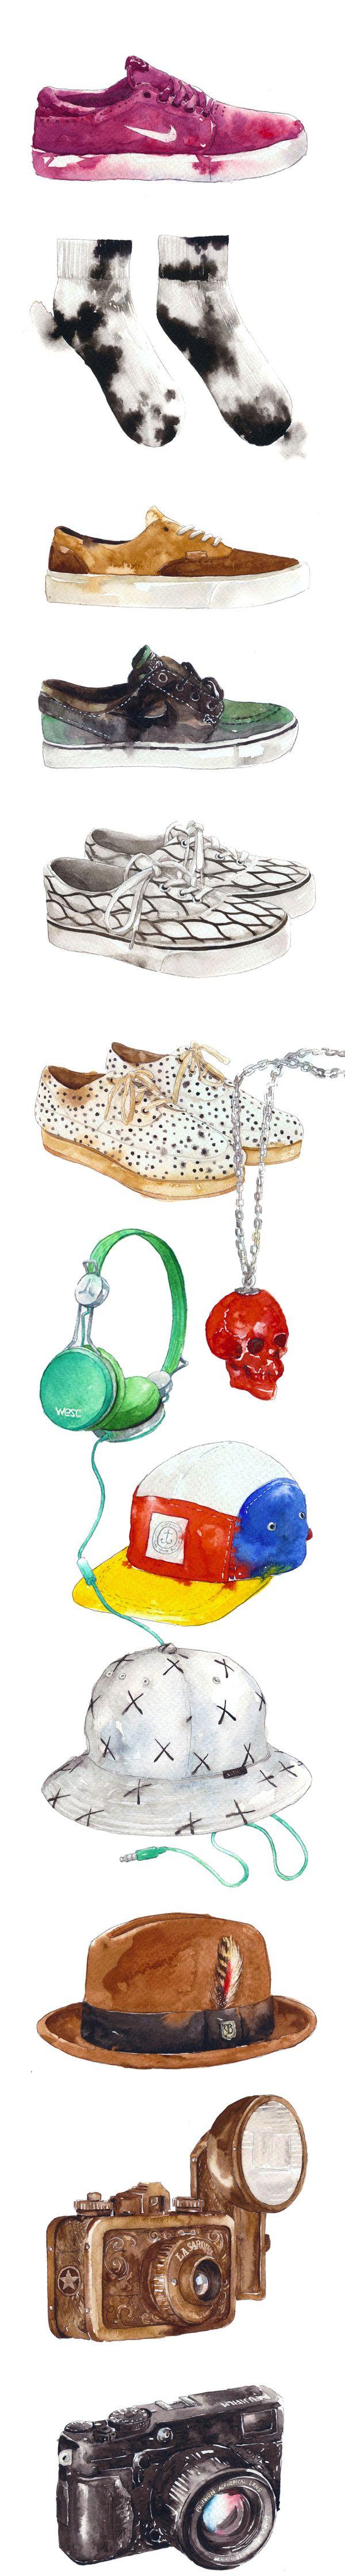 Top to Toe - Product drawings    Bitchslap Magazine by Eunike Nugroho, via Behance